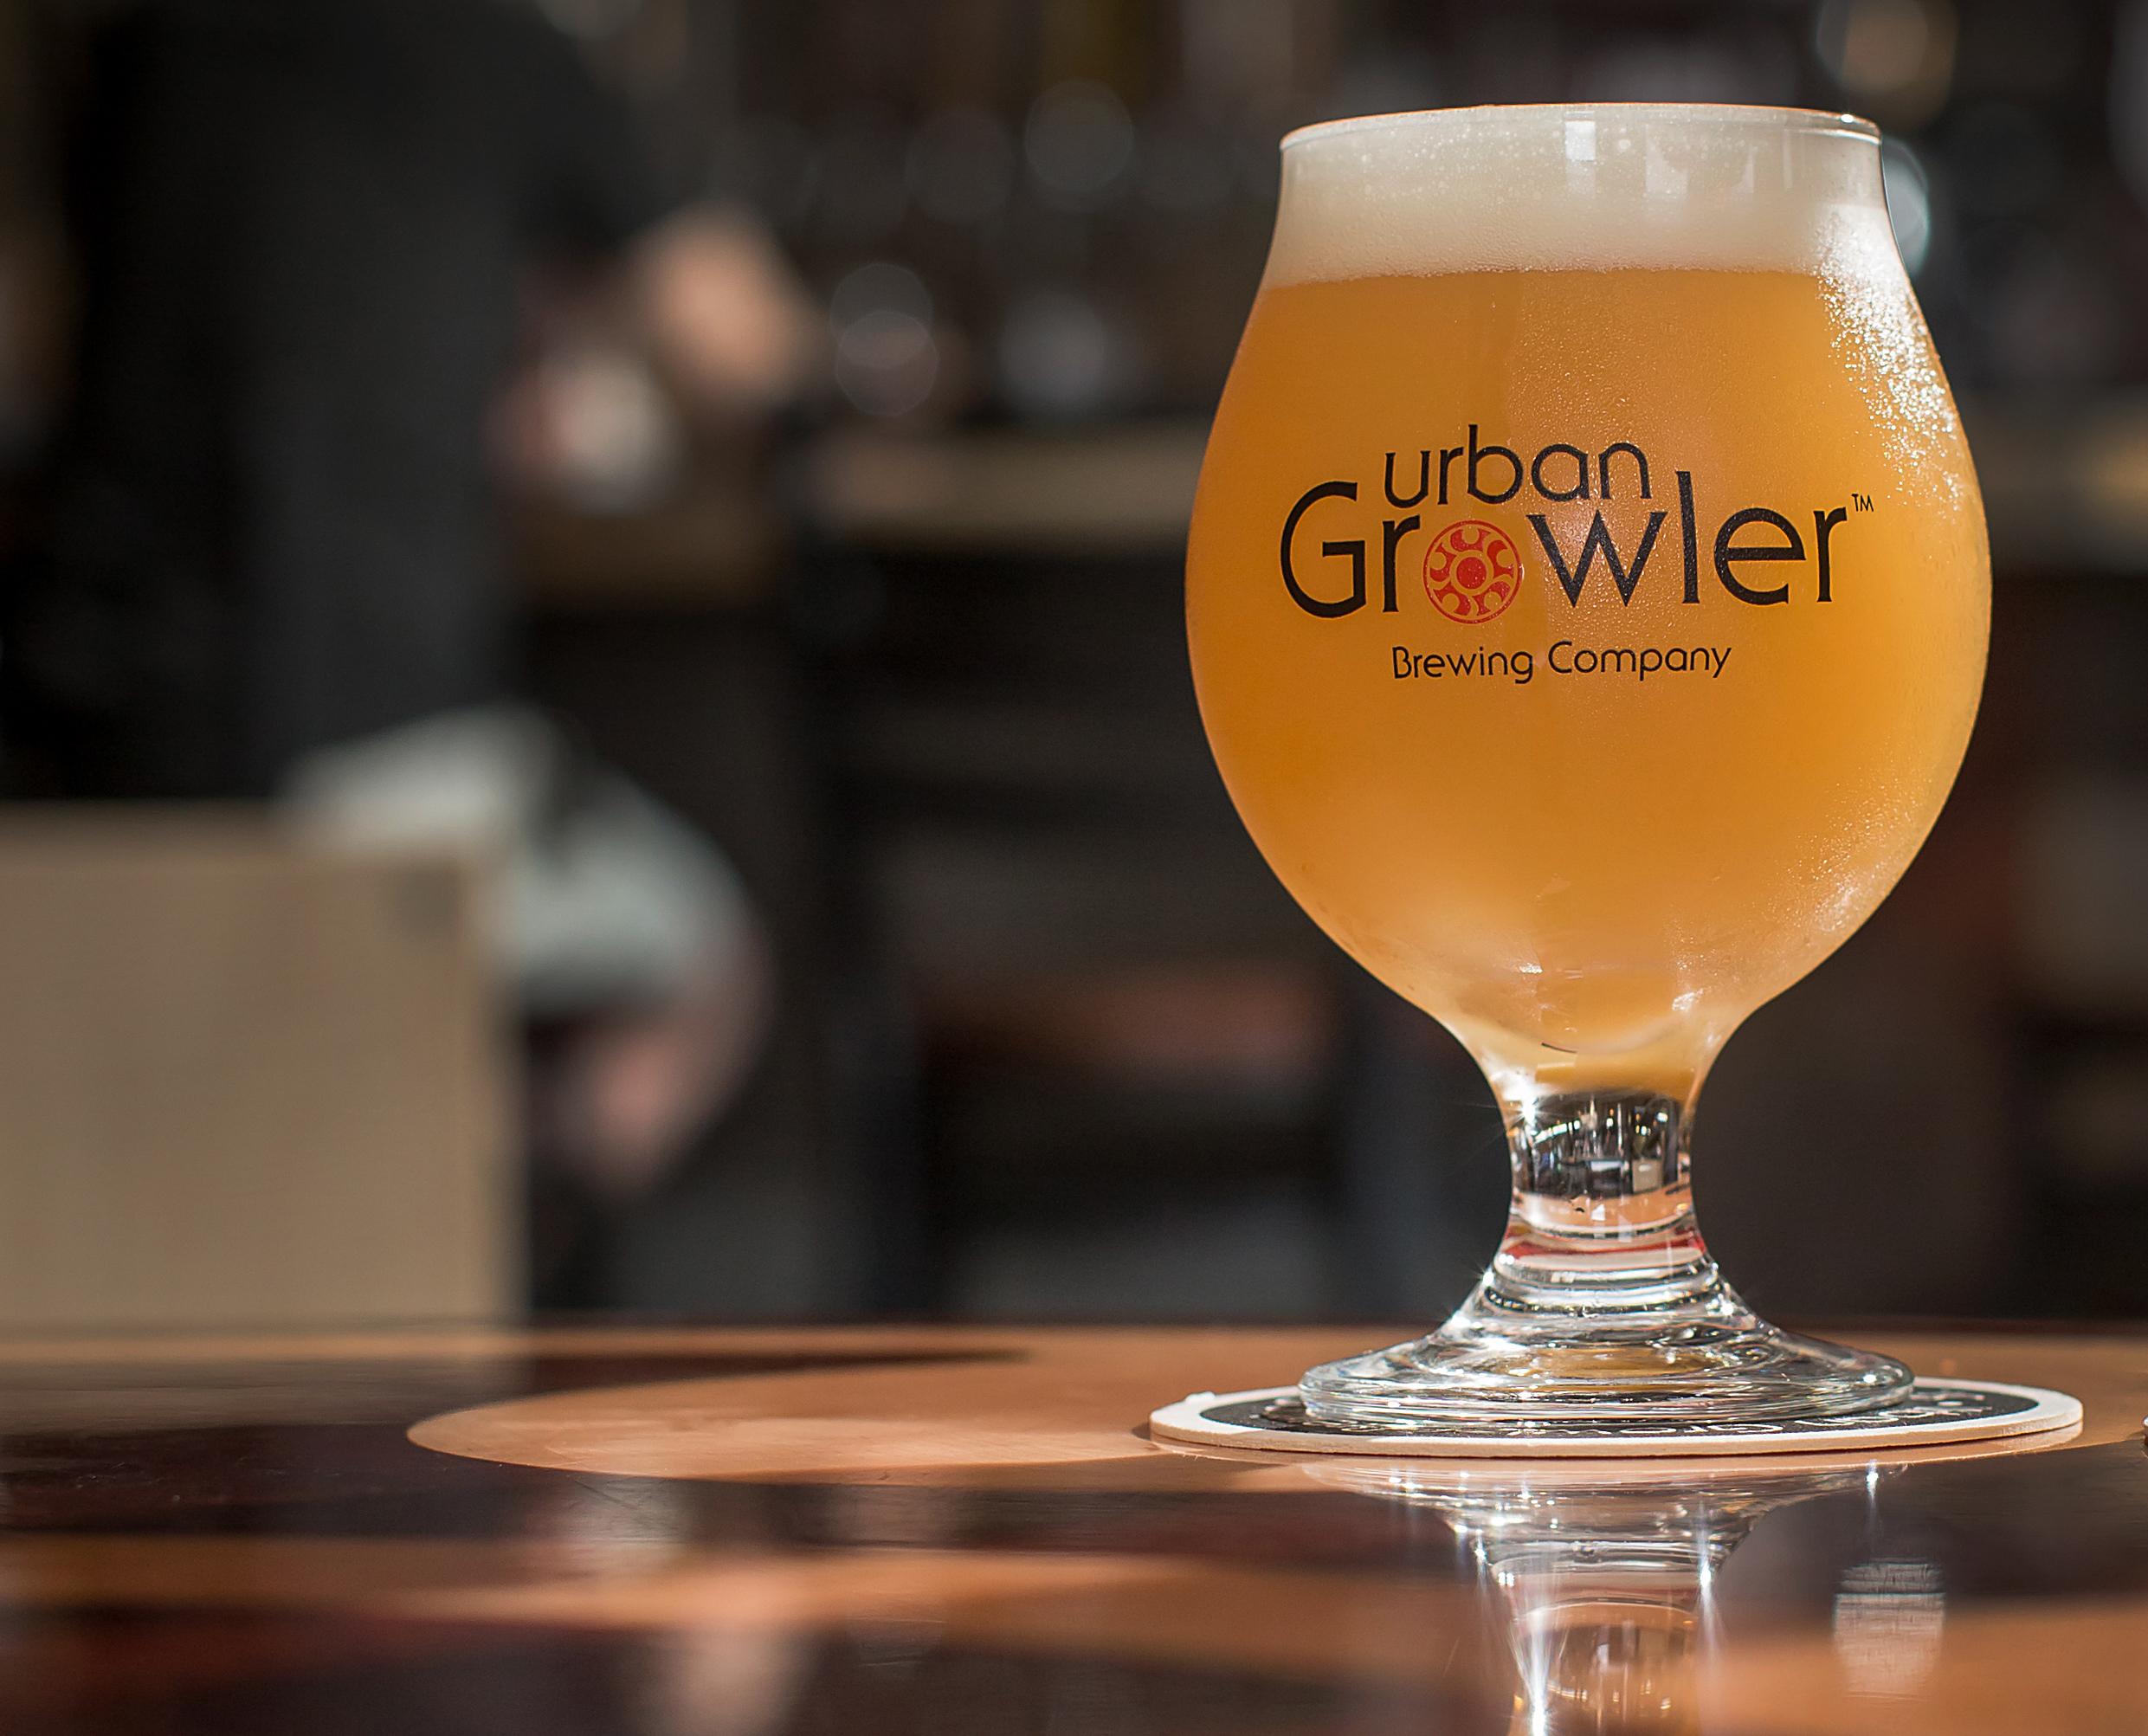 Urban Growler beer